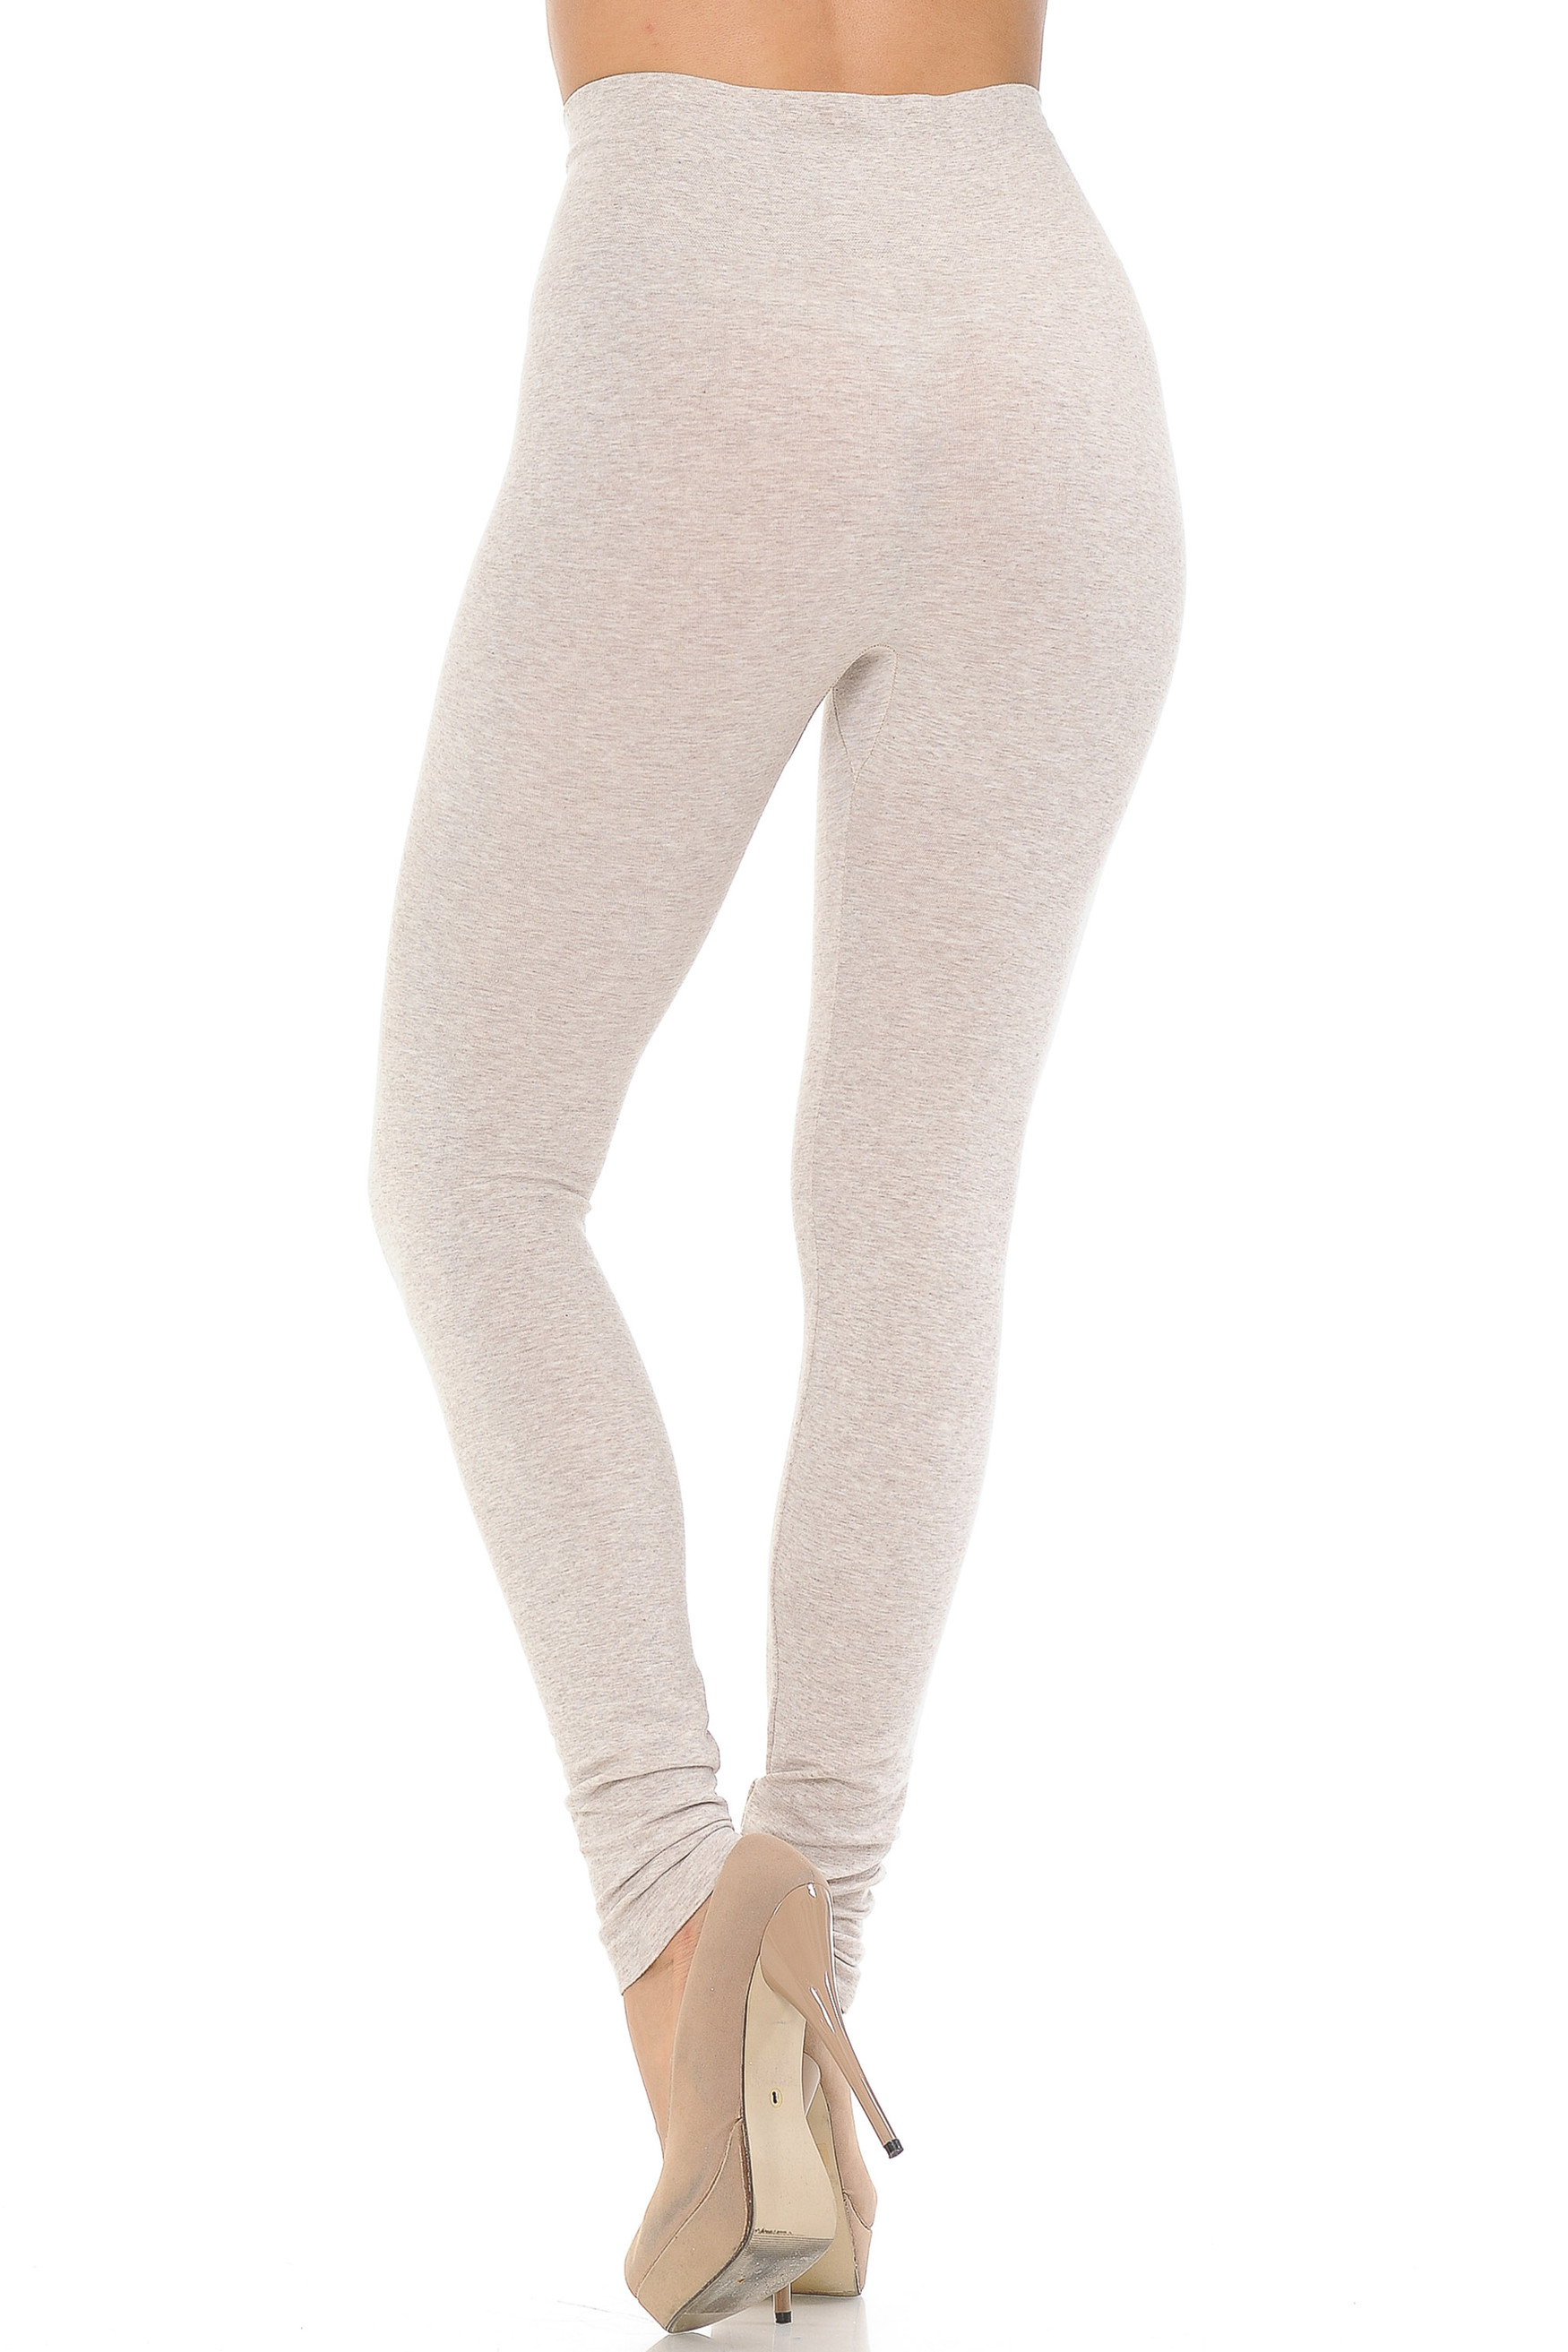 High Waisted Comfy Heathered Leggings